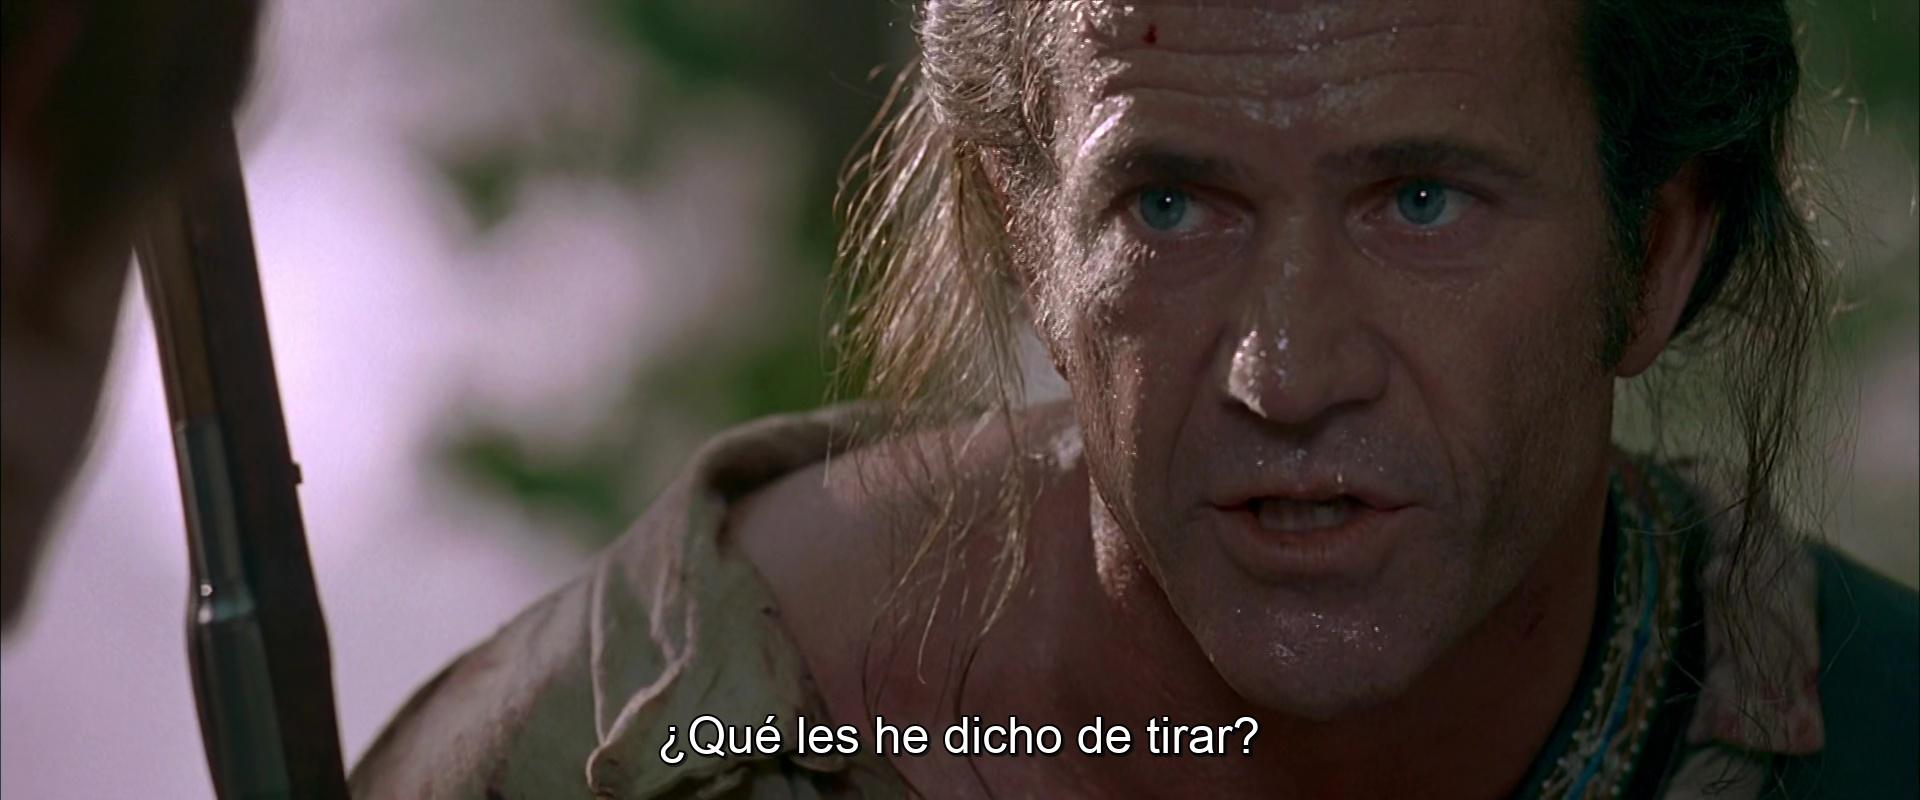 El Patriota(2000) [Theatrical/Open Matte-Extended] x265 1080